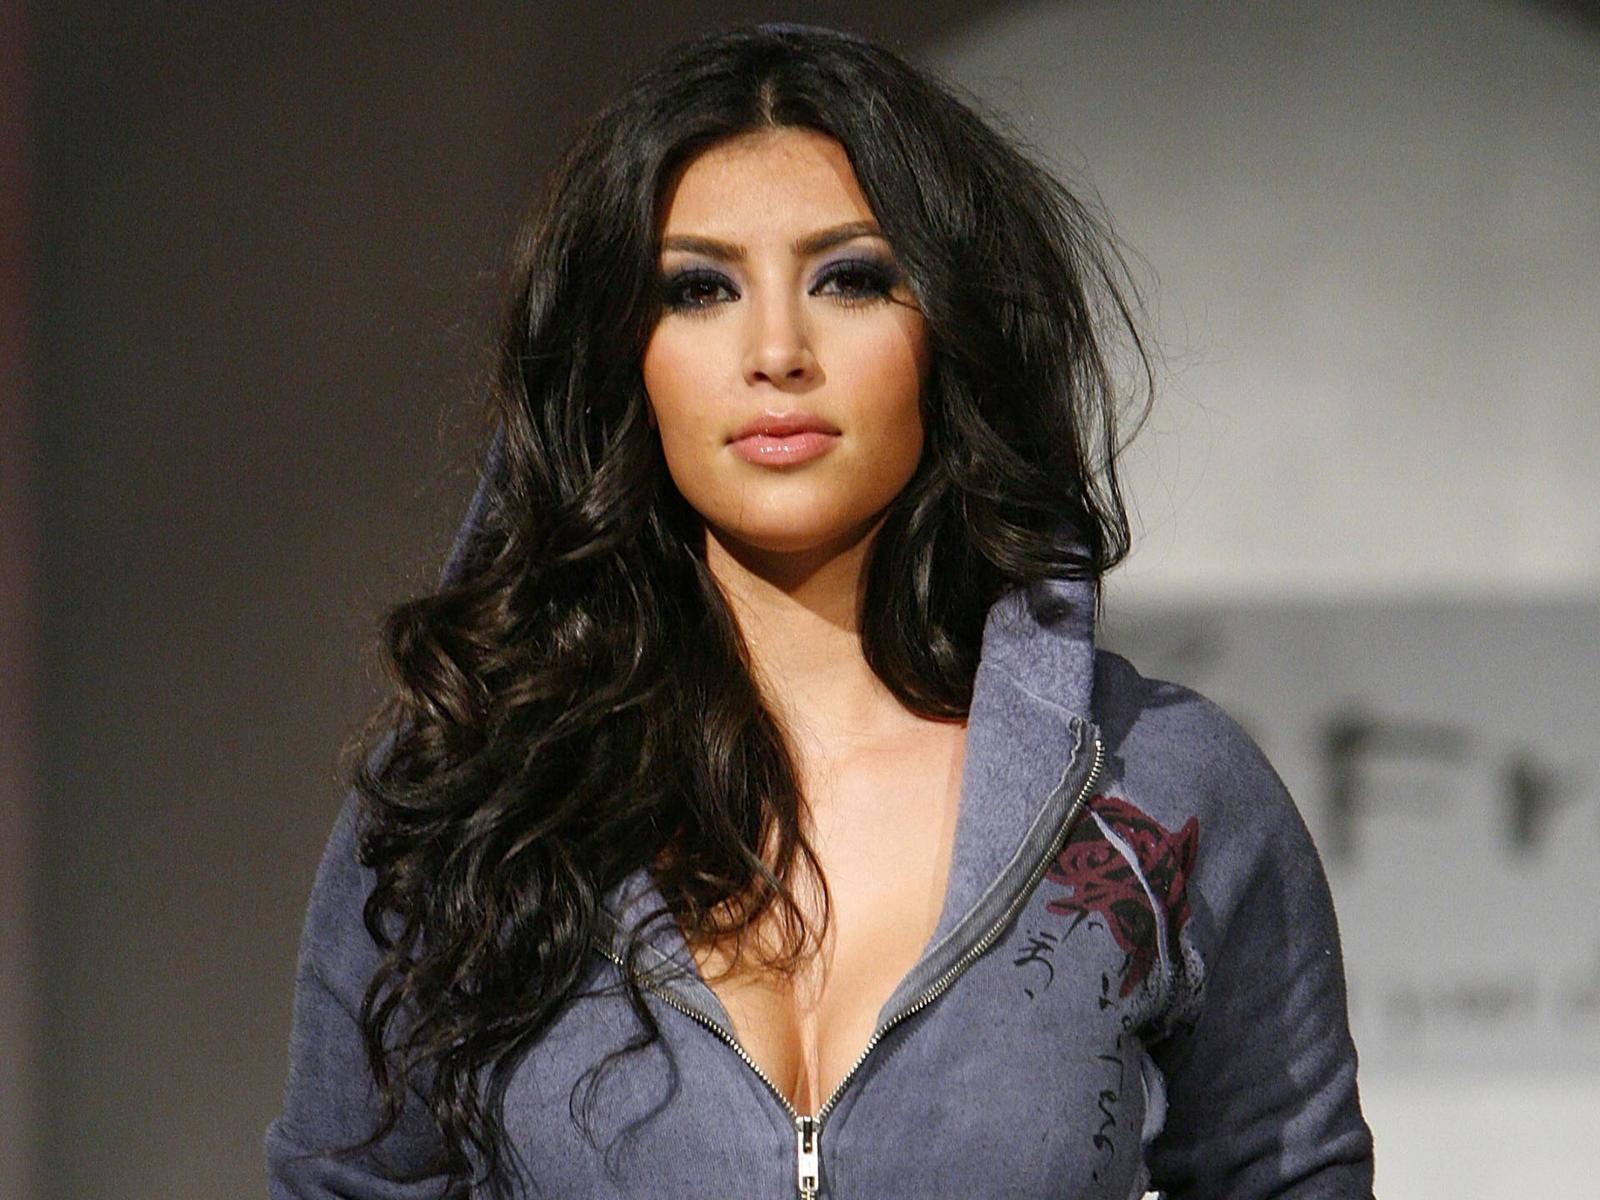 http://2.bp.blogspot.com/-7ZQPOHdCO_0/TsMxBvbq_OI/AAAAAAAAlMk/lK7n_9xVoTI/s1600/kim-kardashian-hot-photo-album-11.jpg